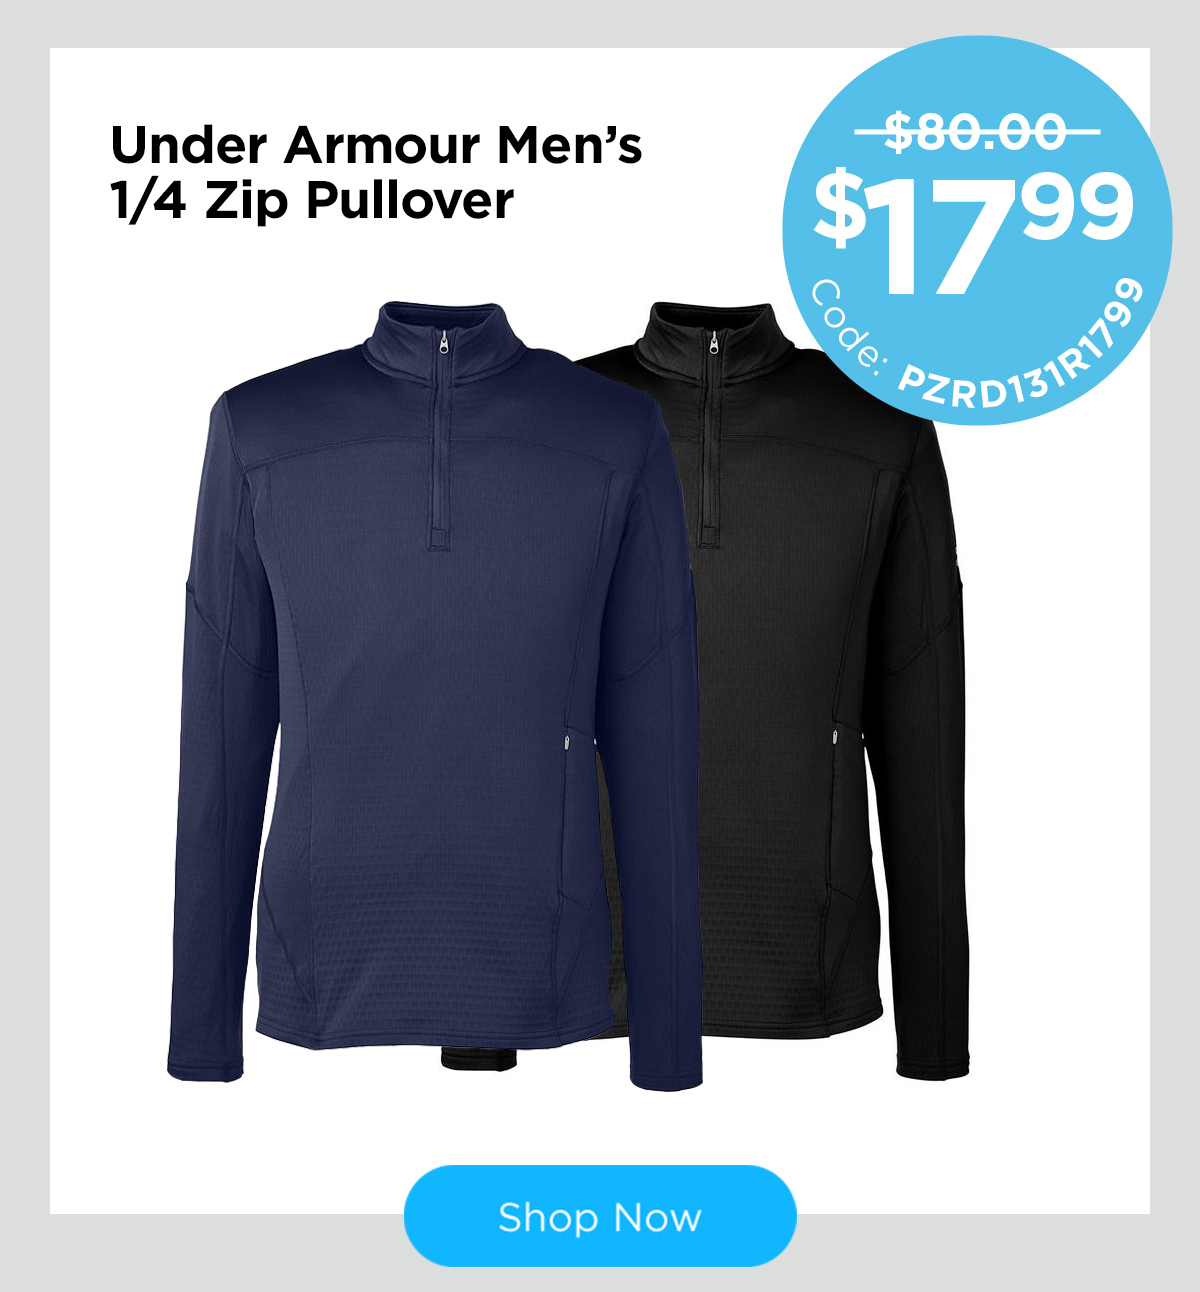 Under Armour Men's Performance Chest Stripe Polo